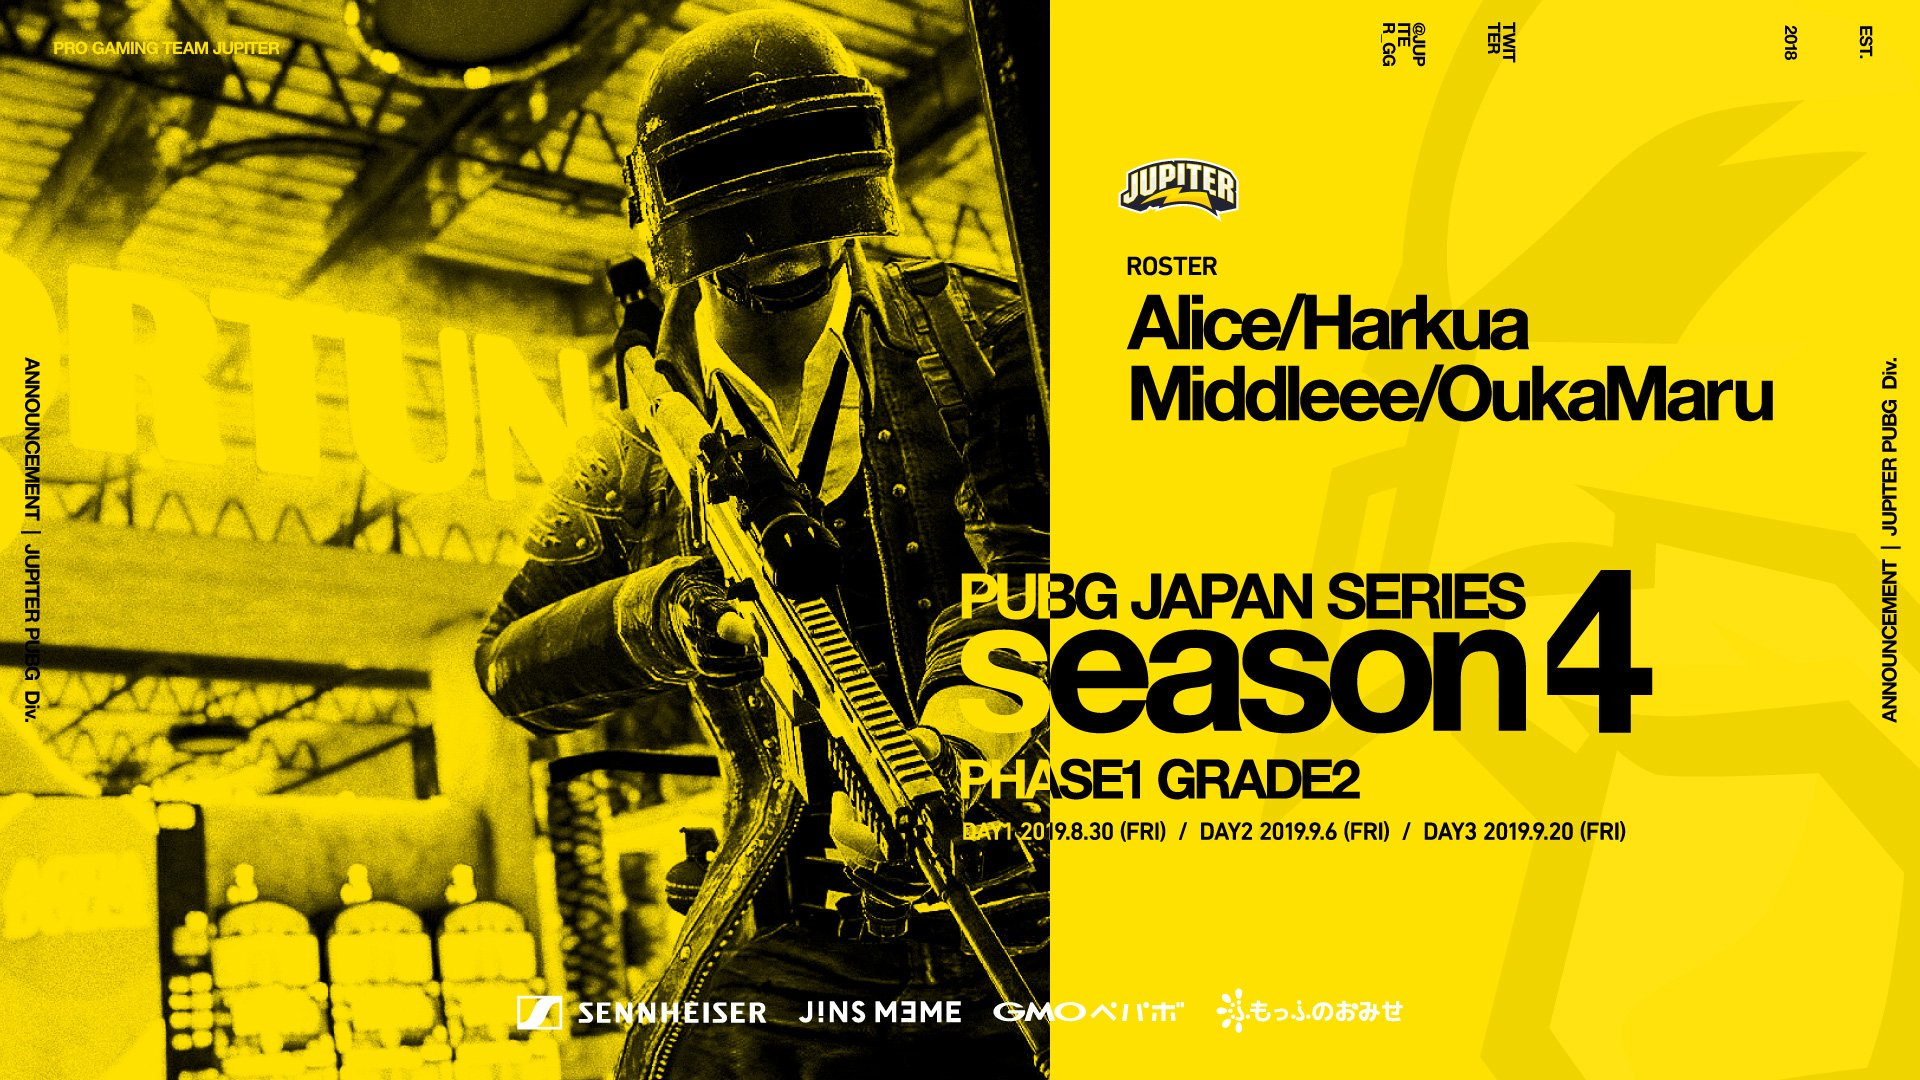 JUPITER CORE – PUBG JAPAN SERIES 2019 Season4 Phase1 Grade2 結果報告 See below for the English News